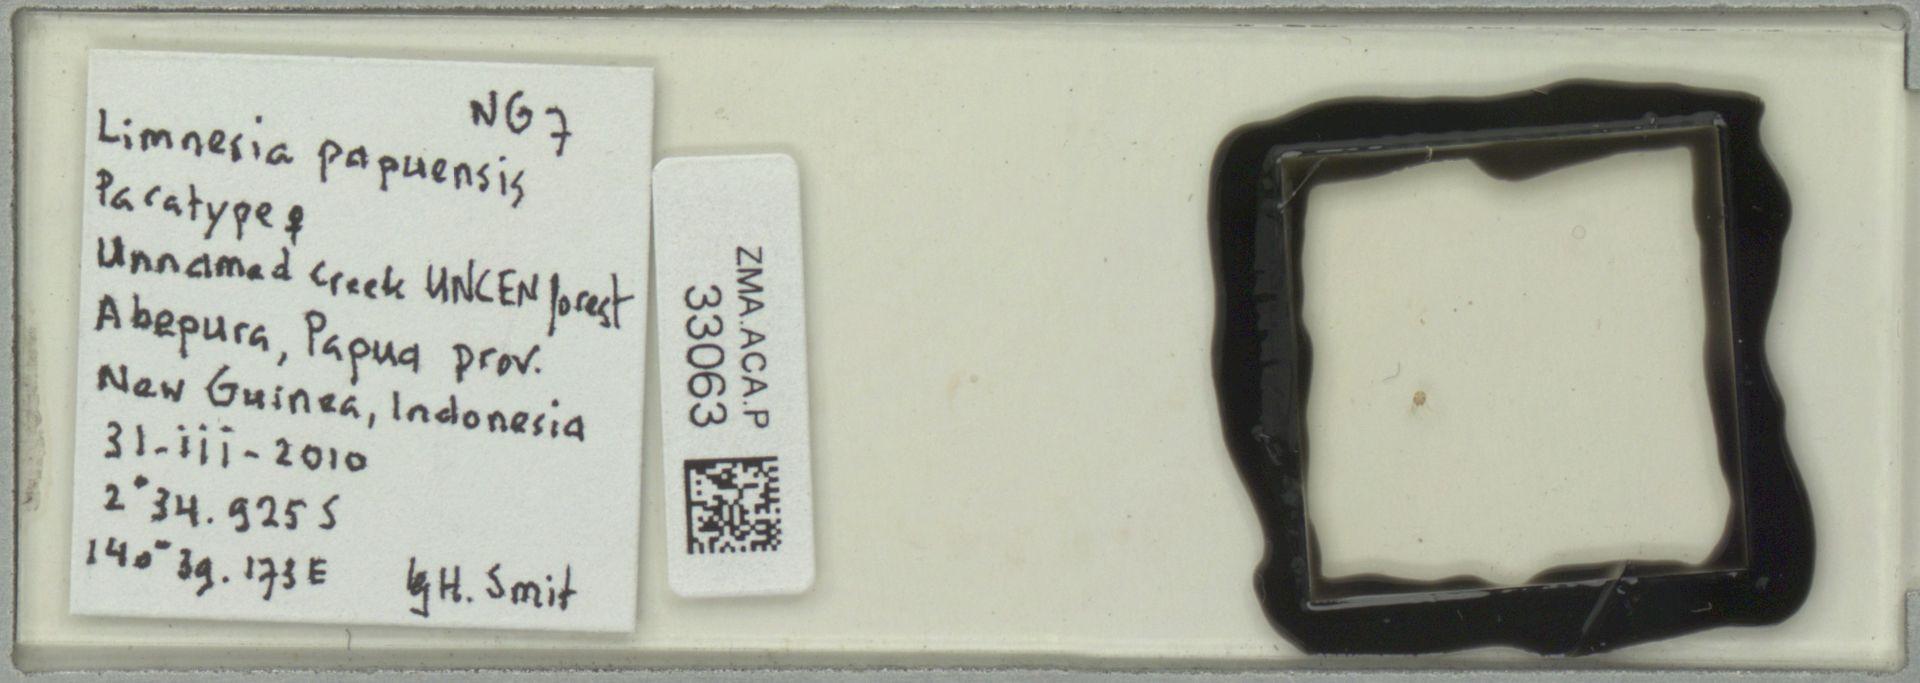 ZMA.ACA.P.33063 | Limnesia papuensis Smit, 2011